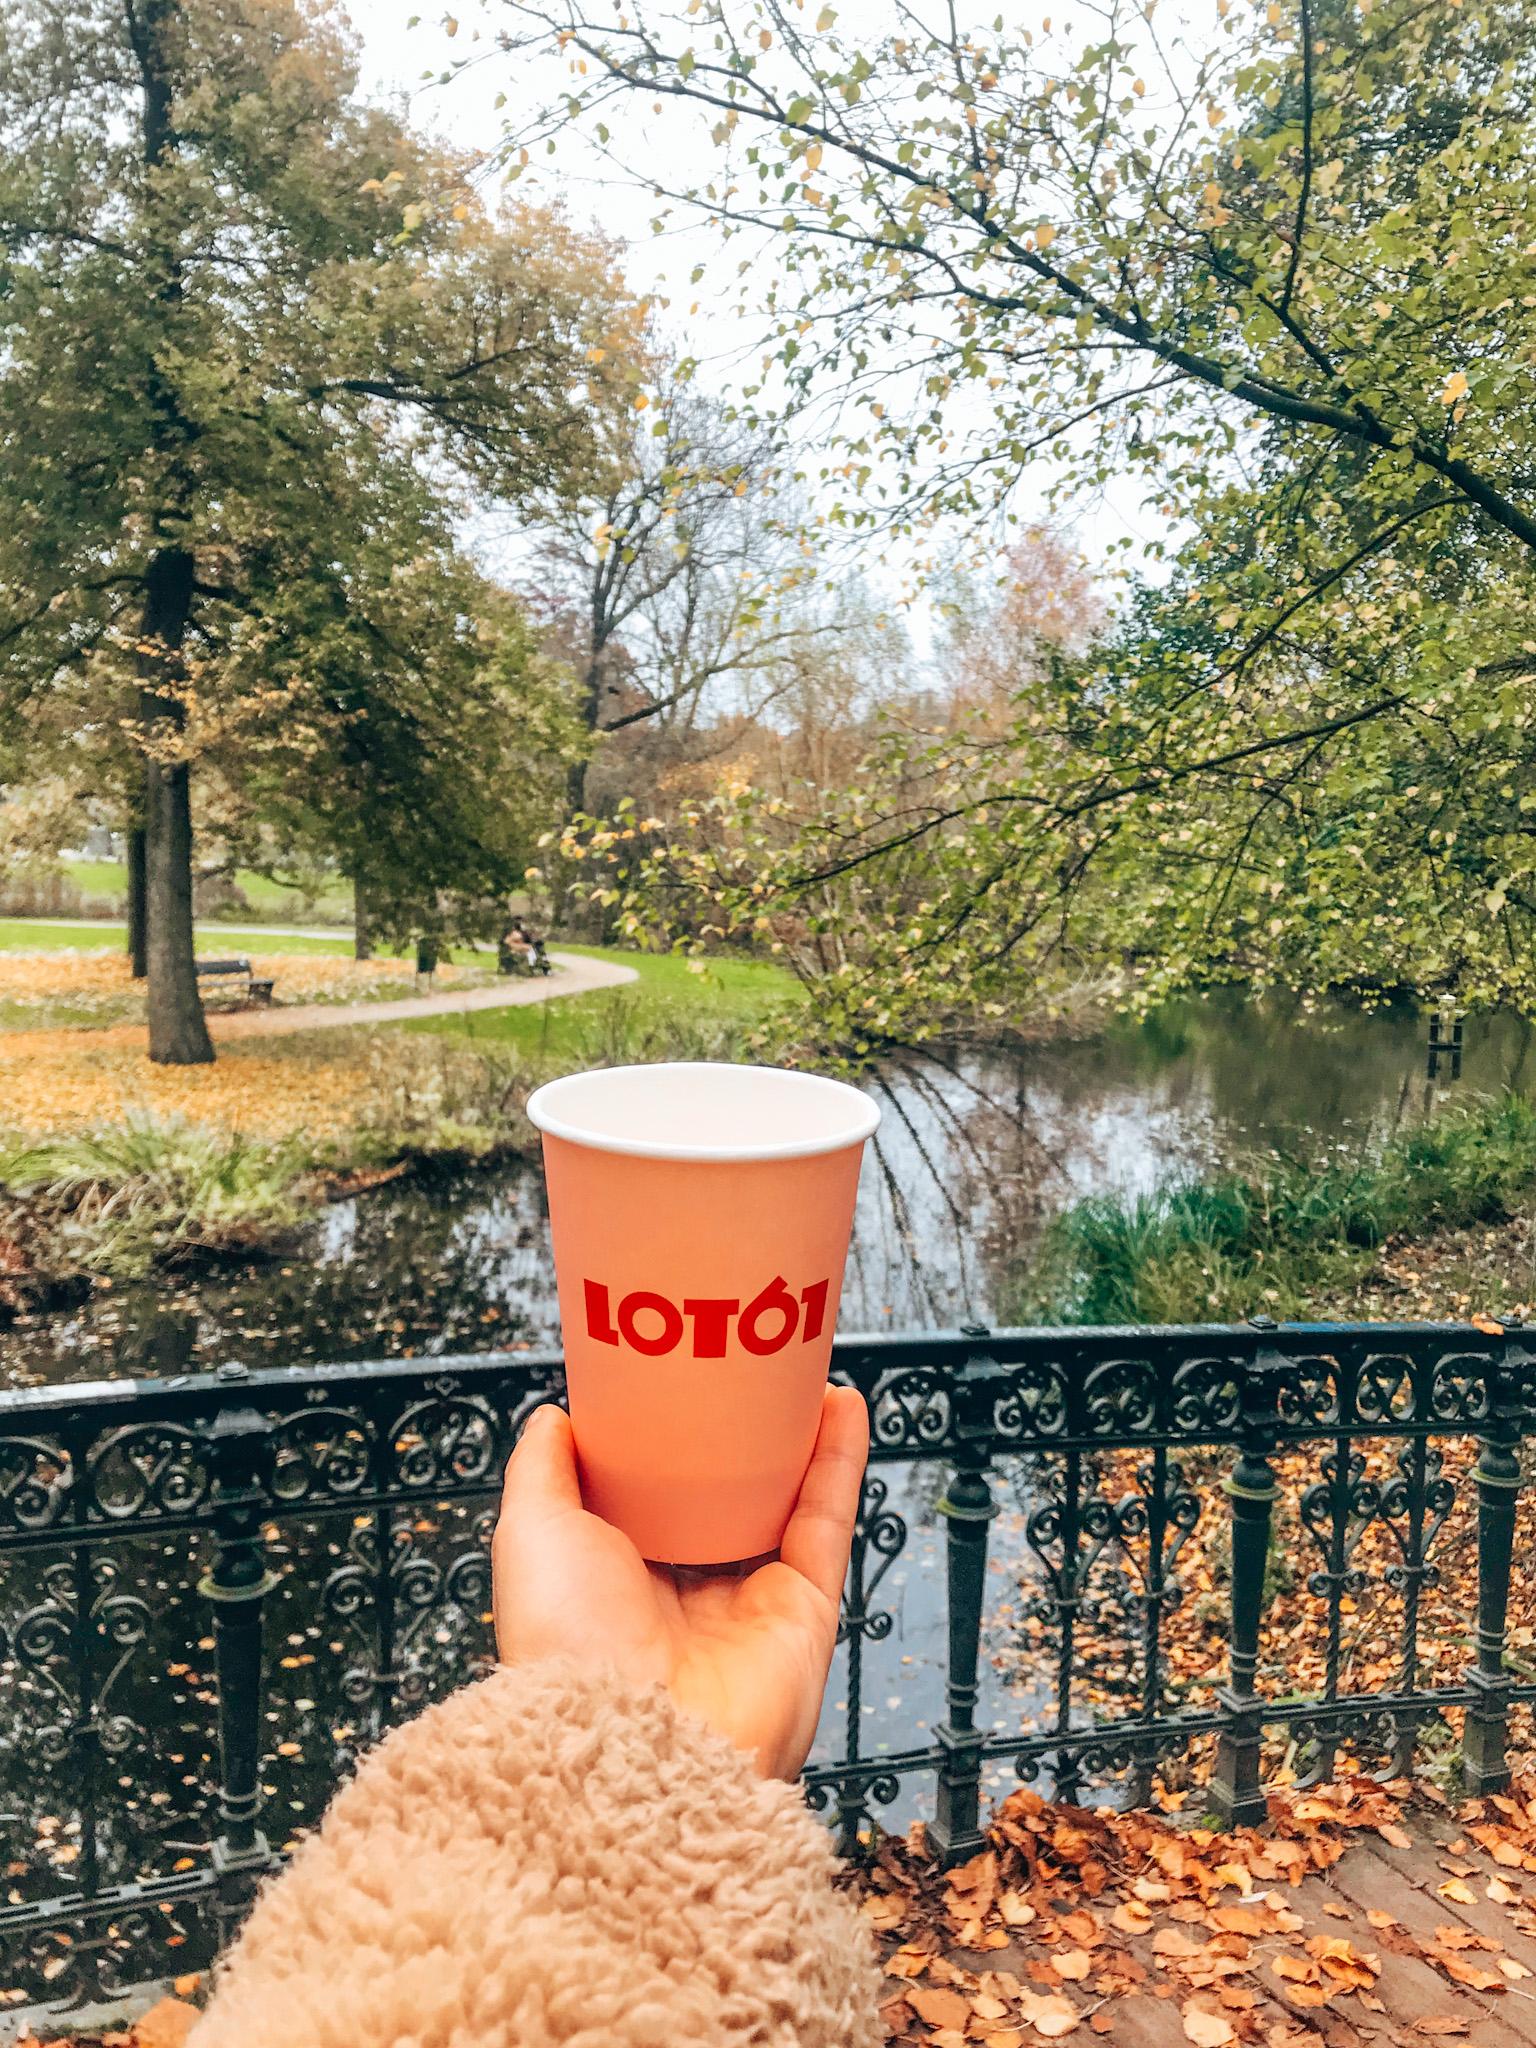 Lot 61, best coffee in Amsterdam